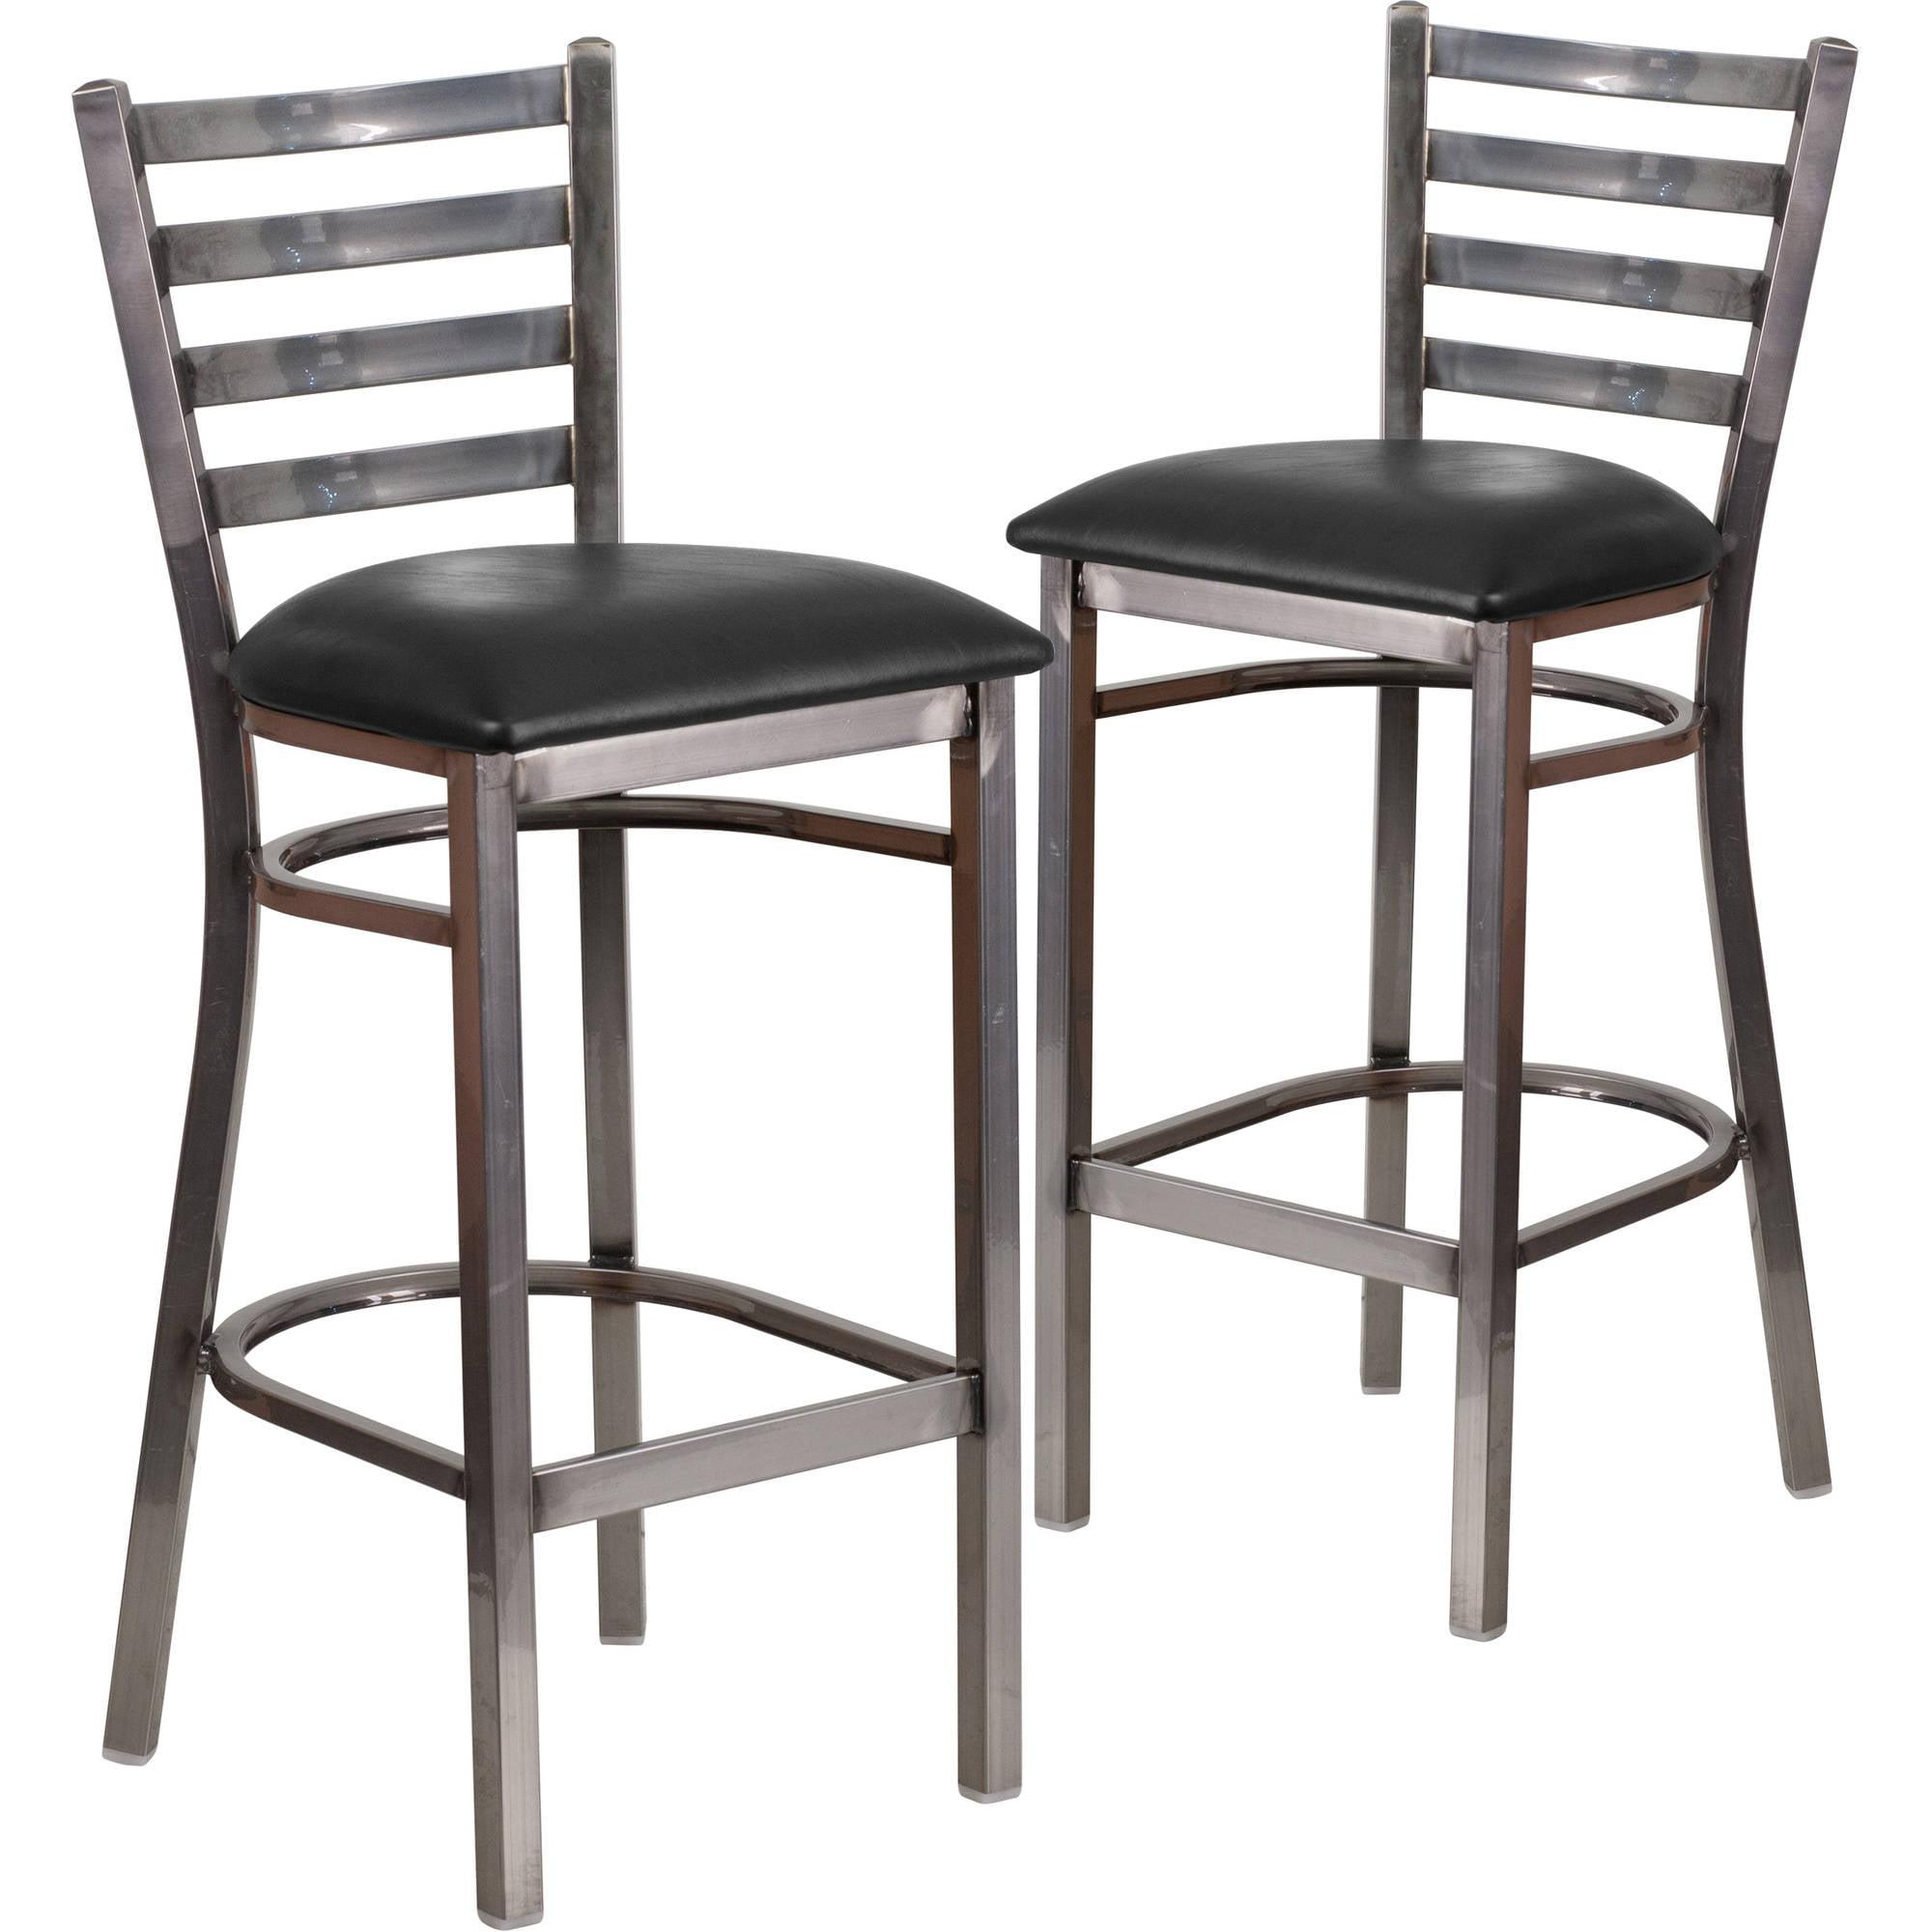 Flash Furniture 2pk HERCULES Series Clear Coated Ladder Back Metal Restaurant Barstool, Vinyl Seat, Multiple Colors